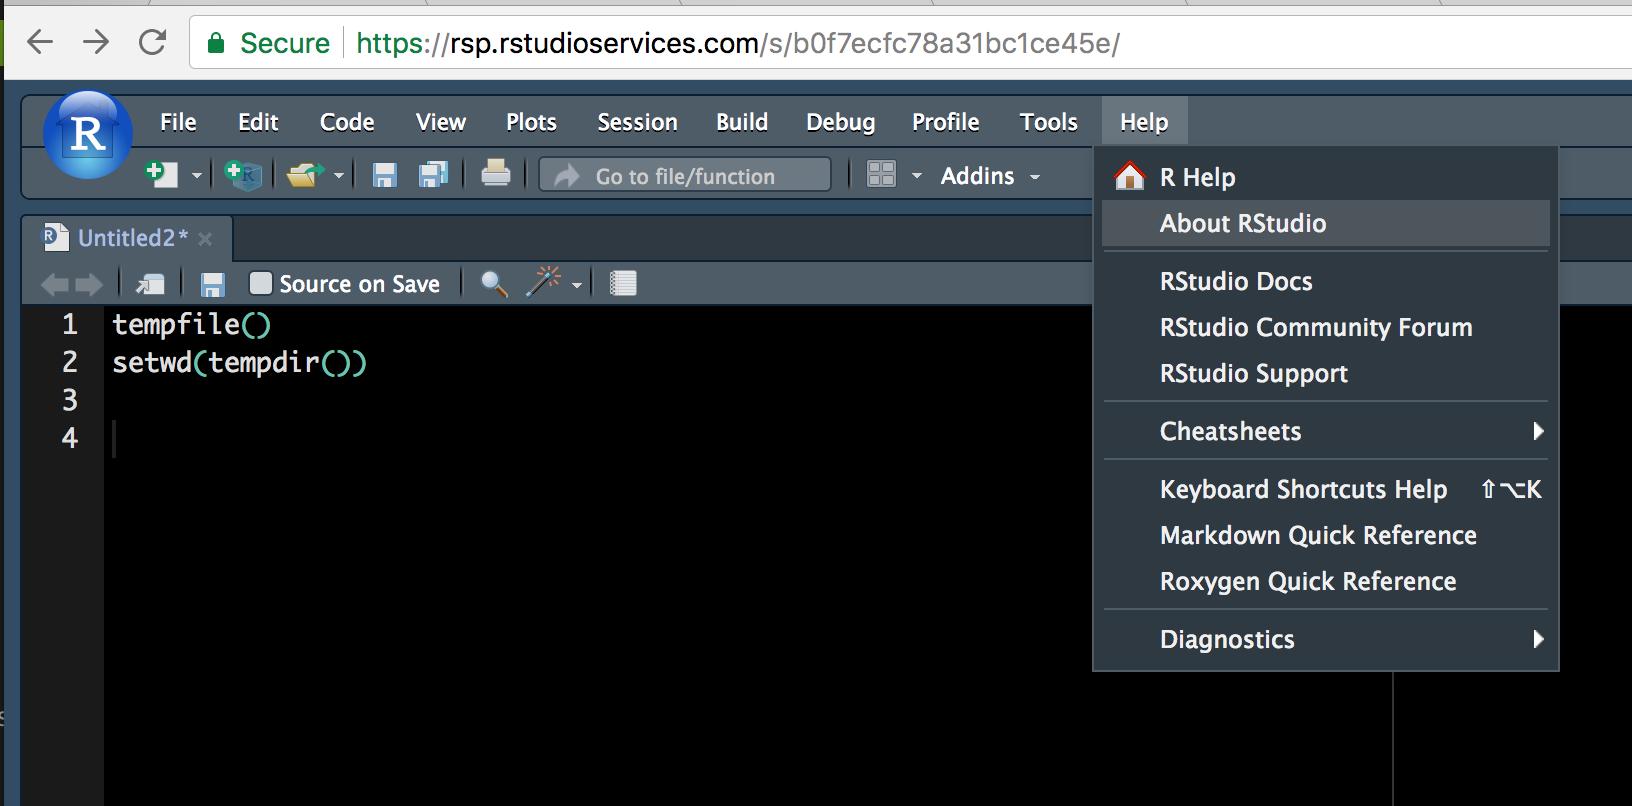 Finding out my rstudio server version on my ubuntu - RStudio